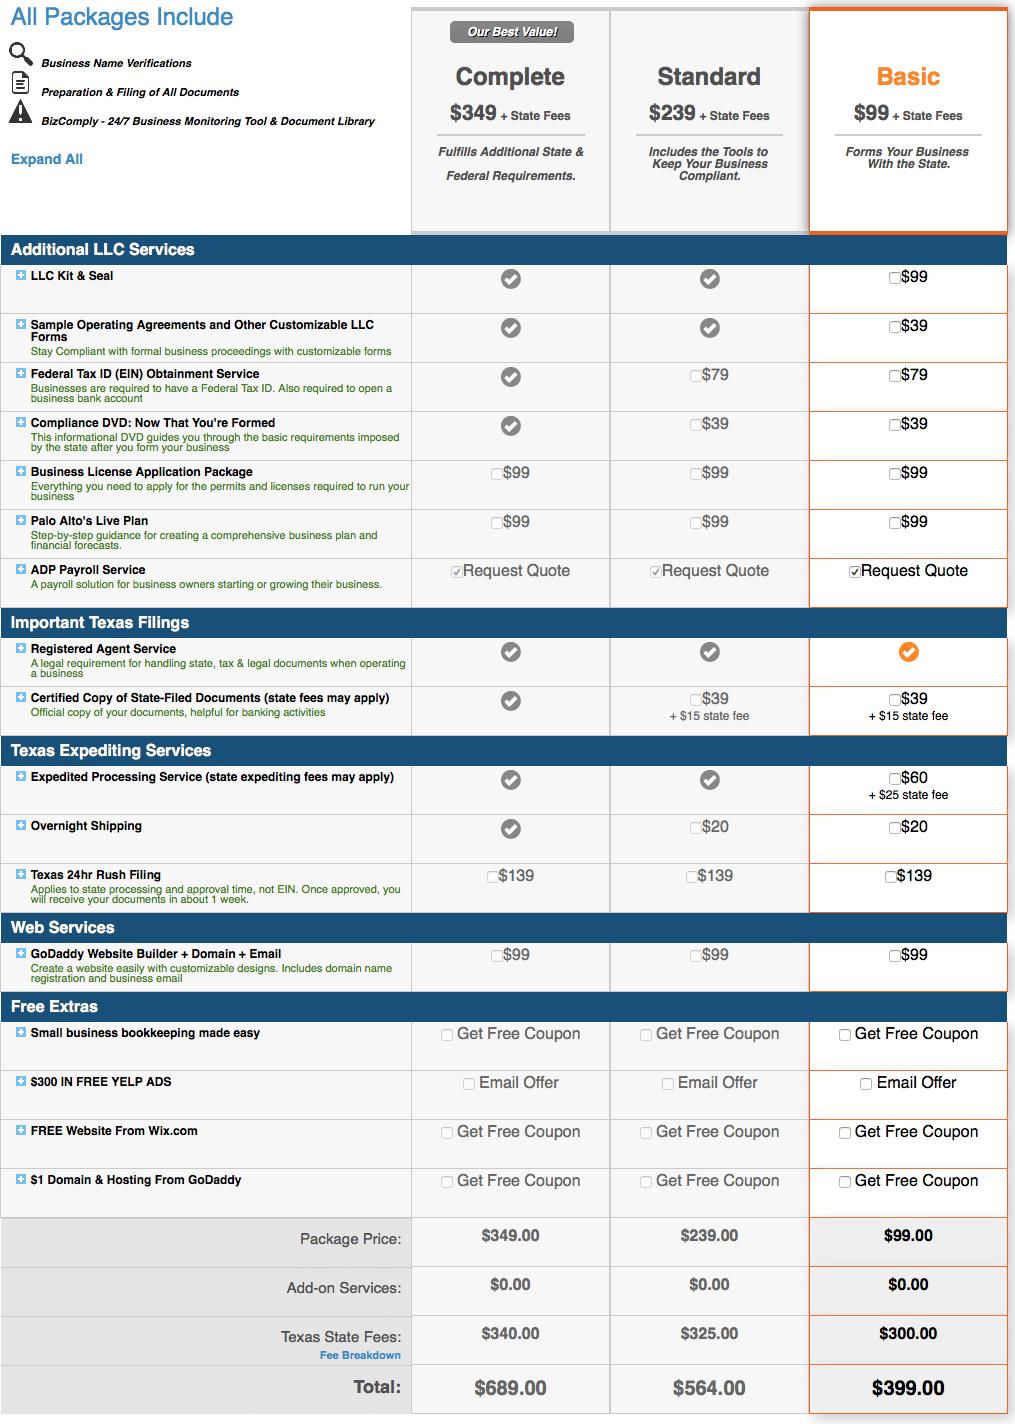 bizfilings vs northwest pricing